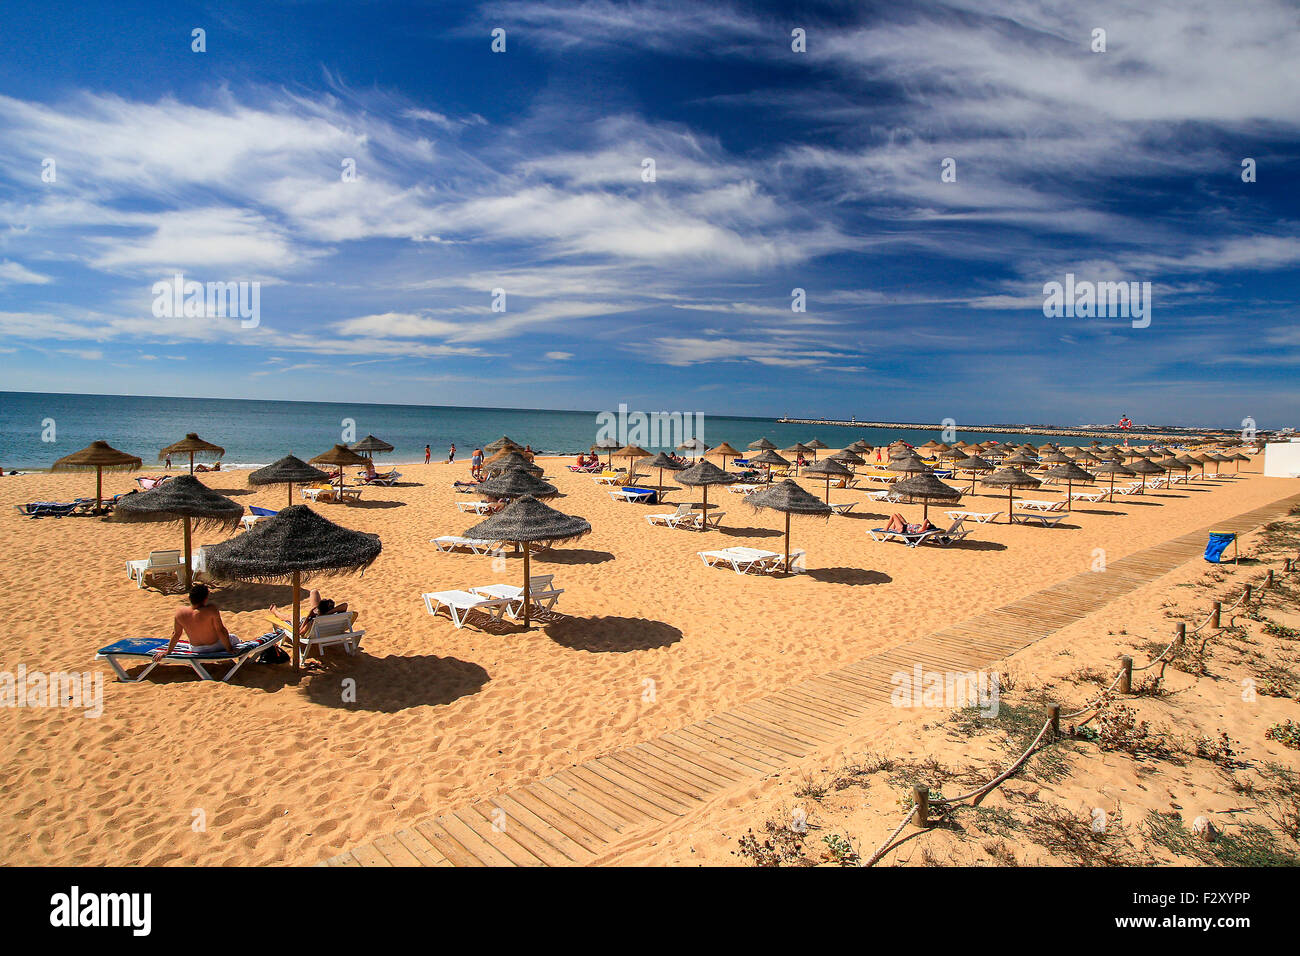 Algarve Strand Portugal mit Stroh Sonnenschirme Sonnenschirme. Stockbild